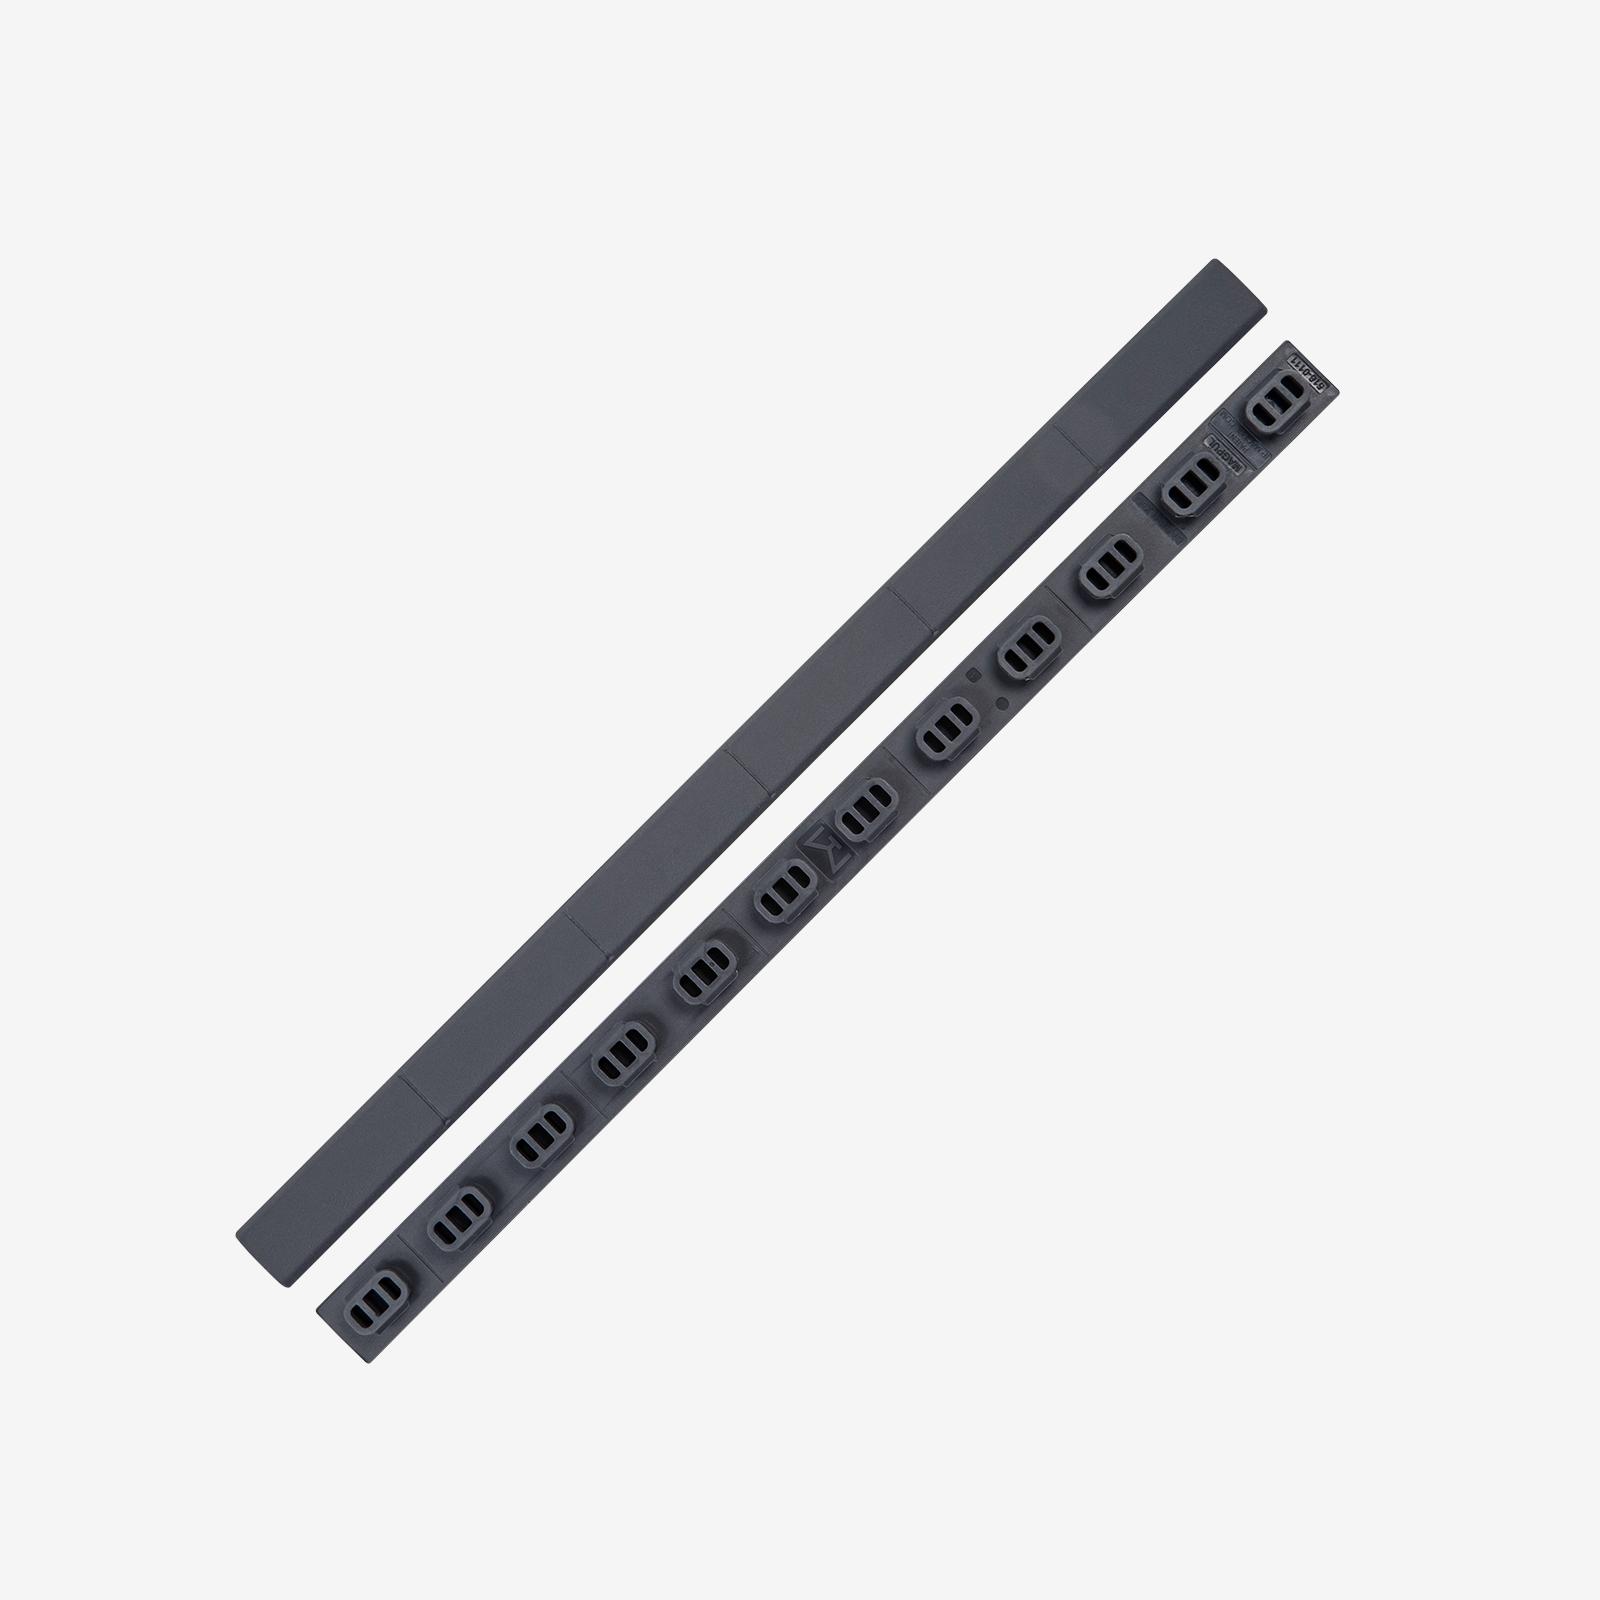 Magpul Magpul M-LOK Rail Cover, Type 1 M-Lok System - Stealth Gray